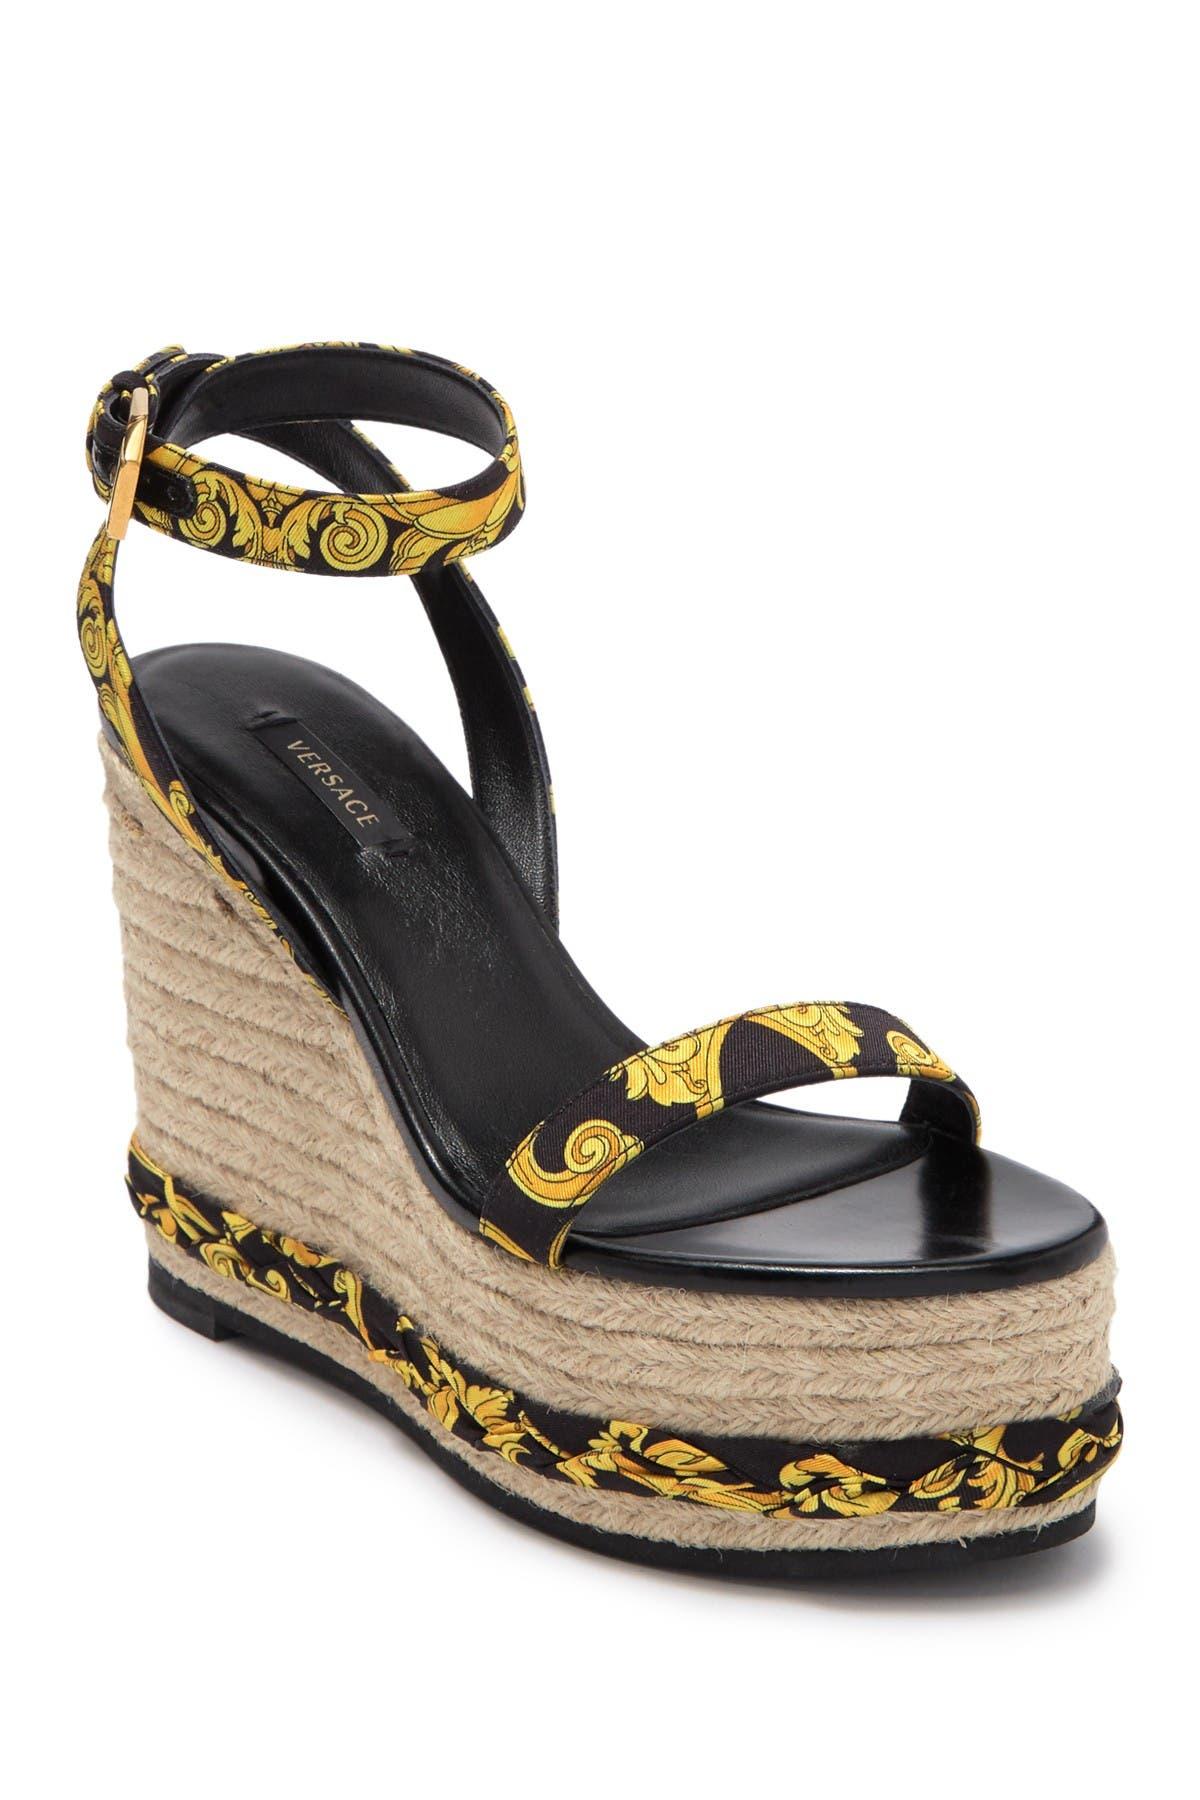 Baroque Leather Espadrille Wedge Heel